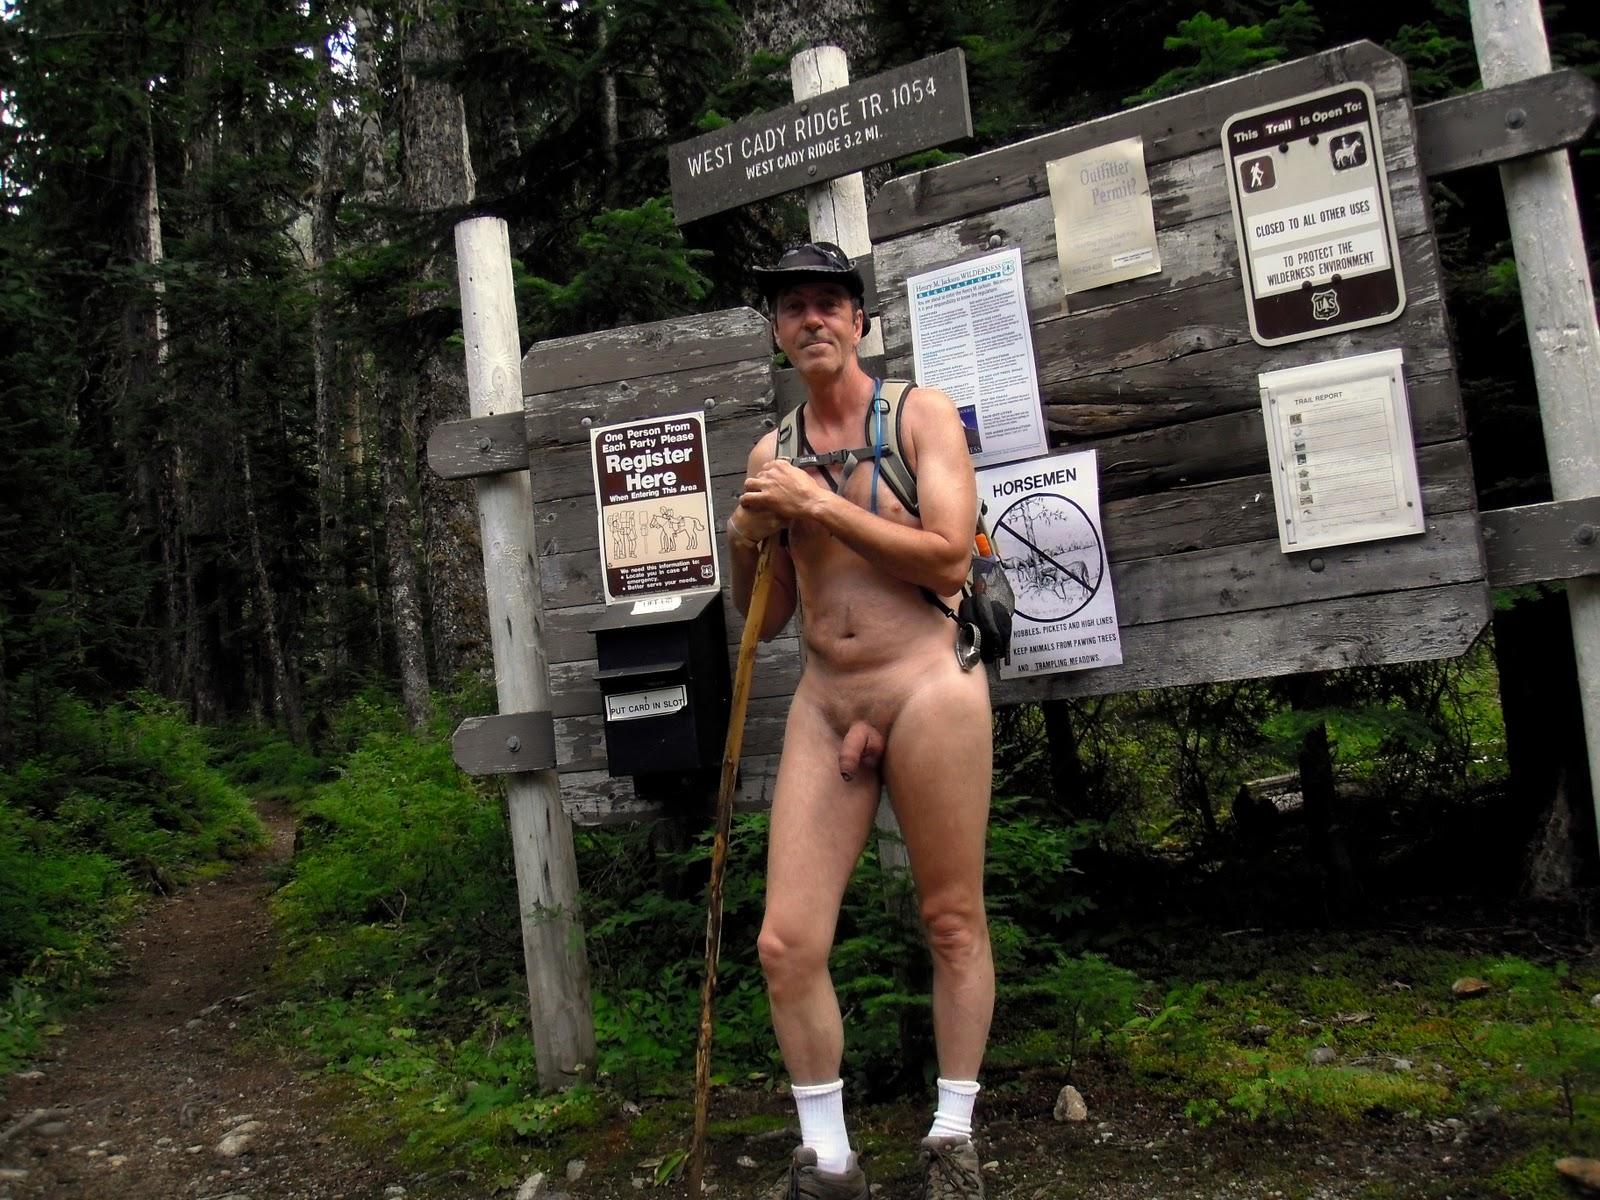 Nude hiking trails